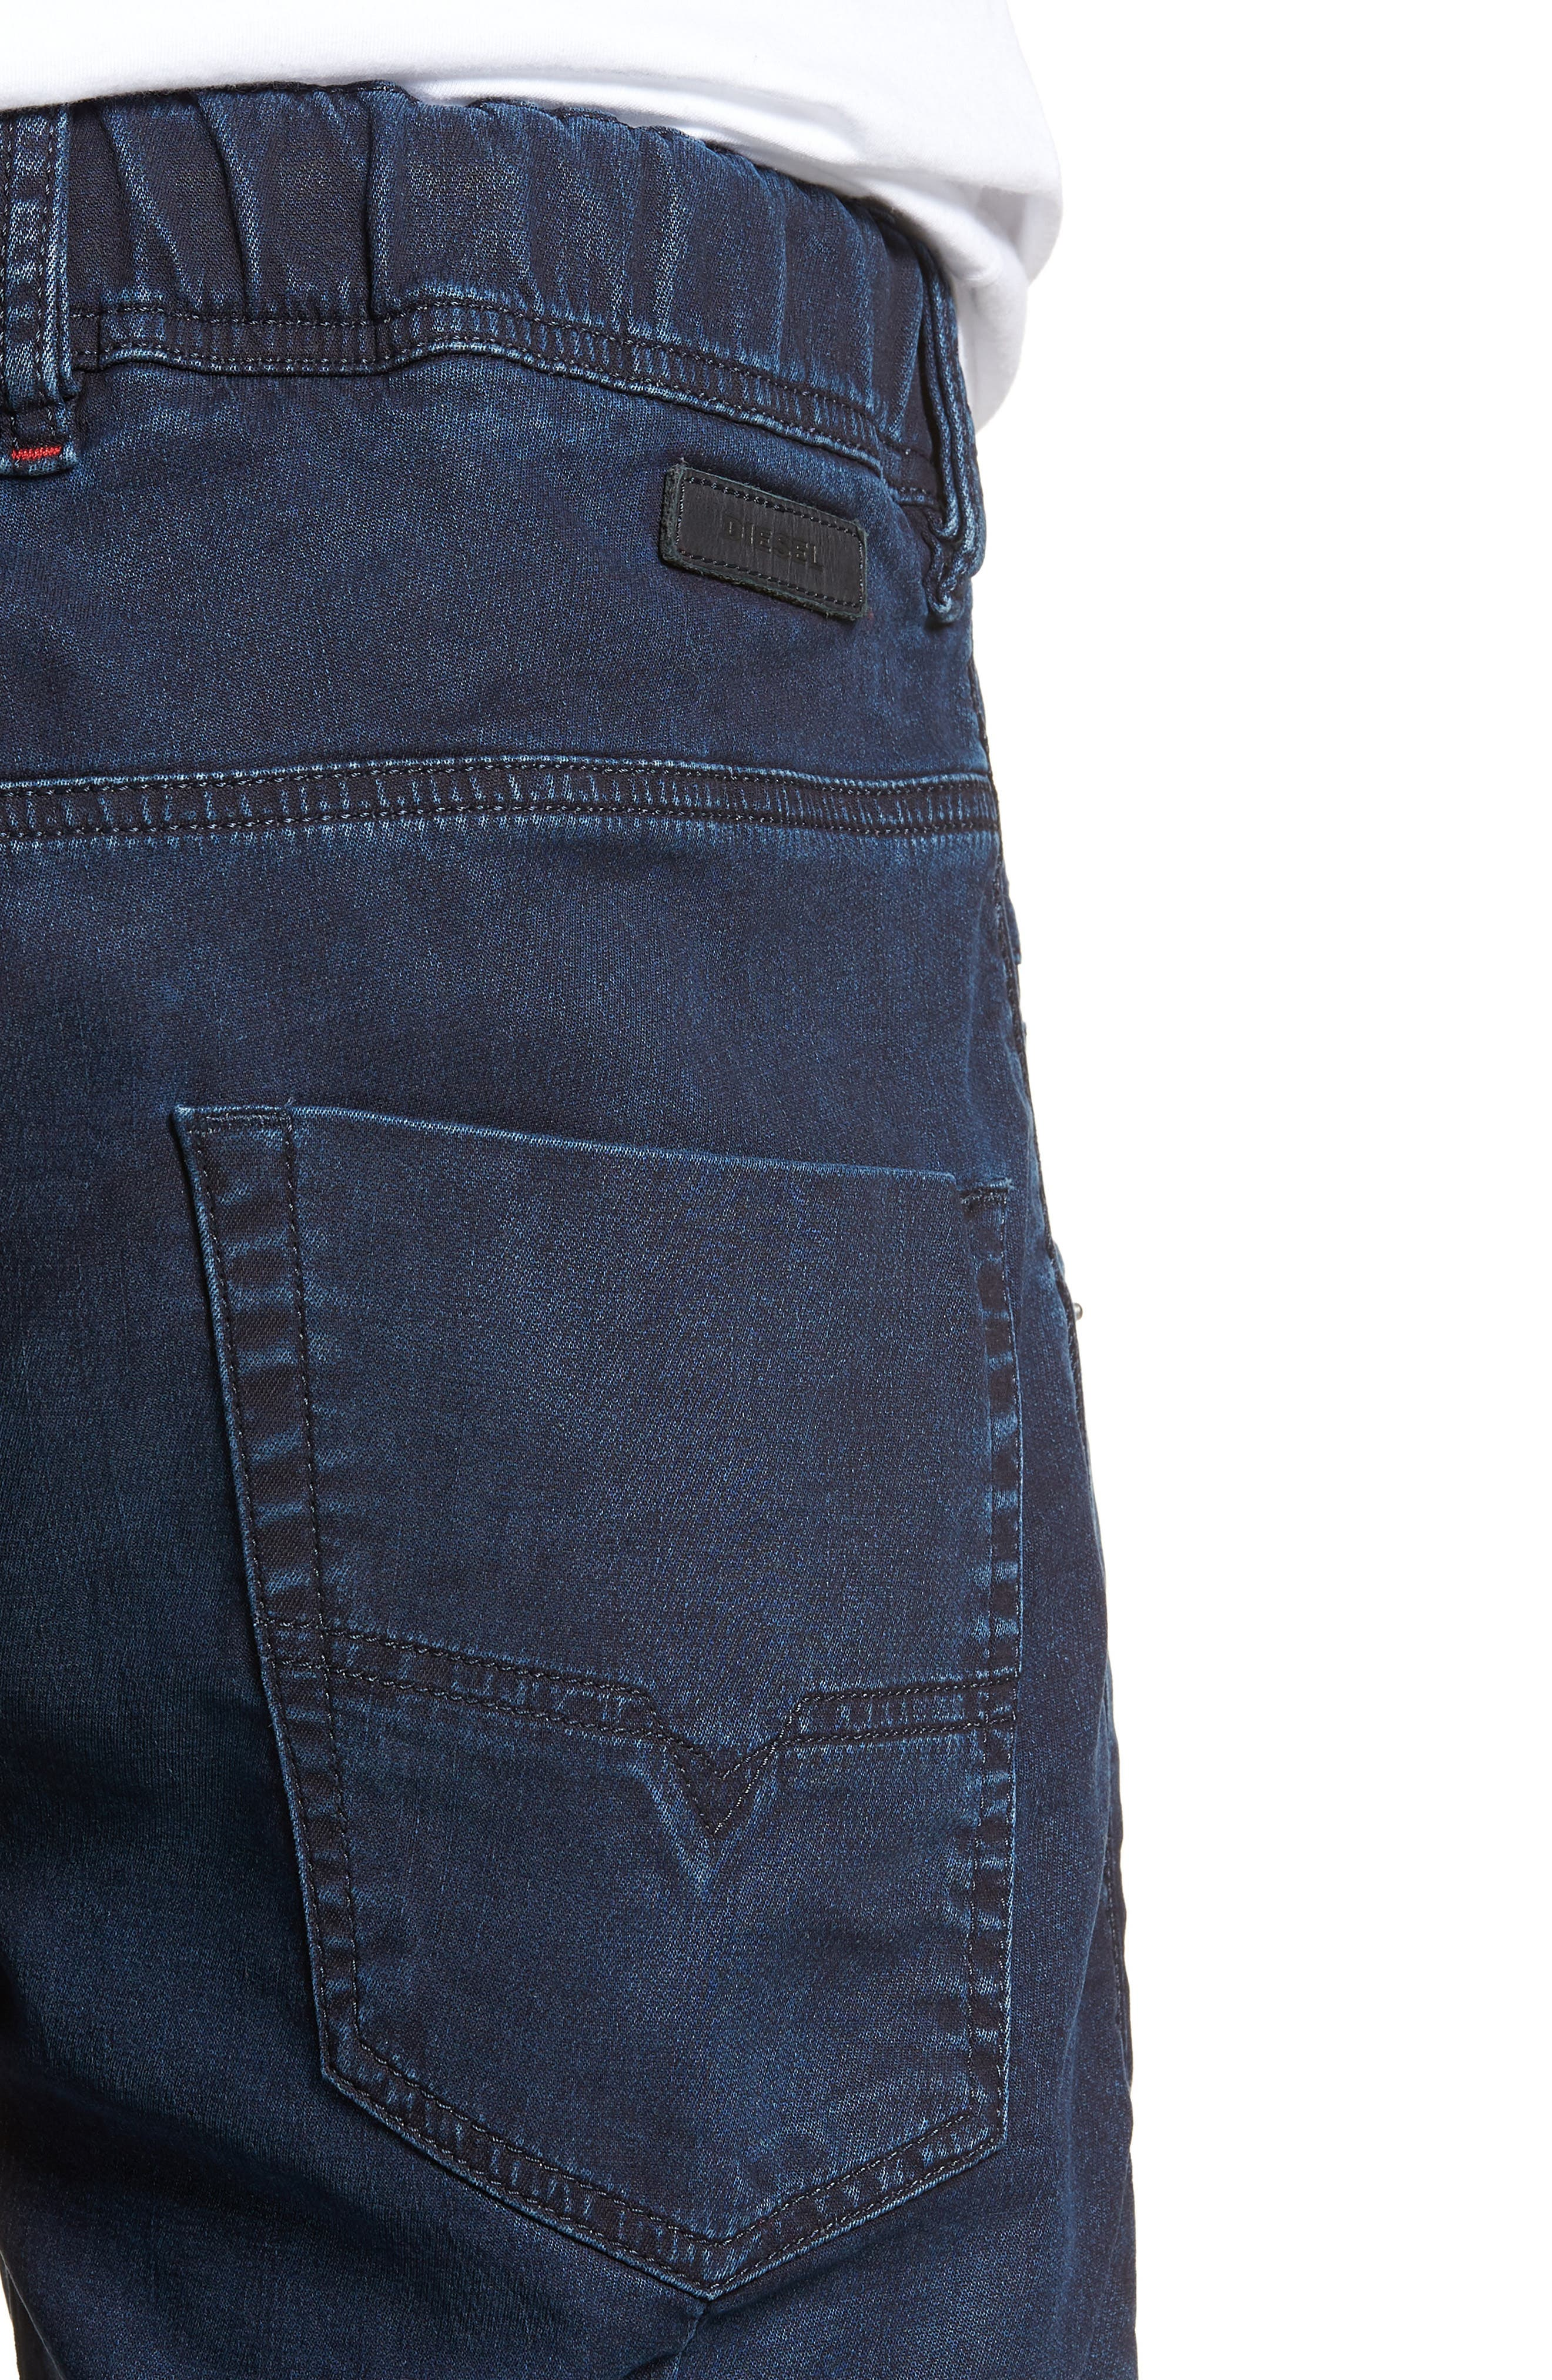 Krooshort Denim Shorts,                             Alternate thumbnail 4, color,                             0699C